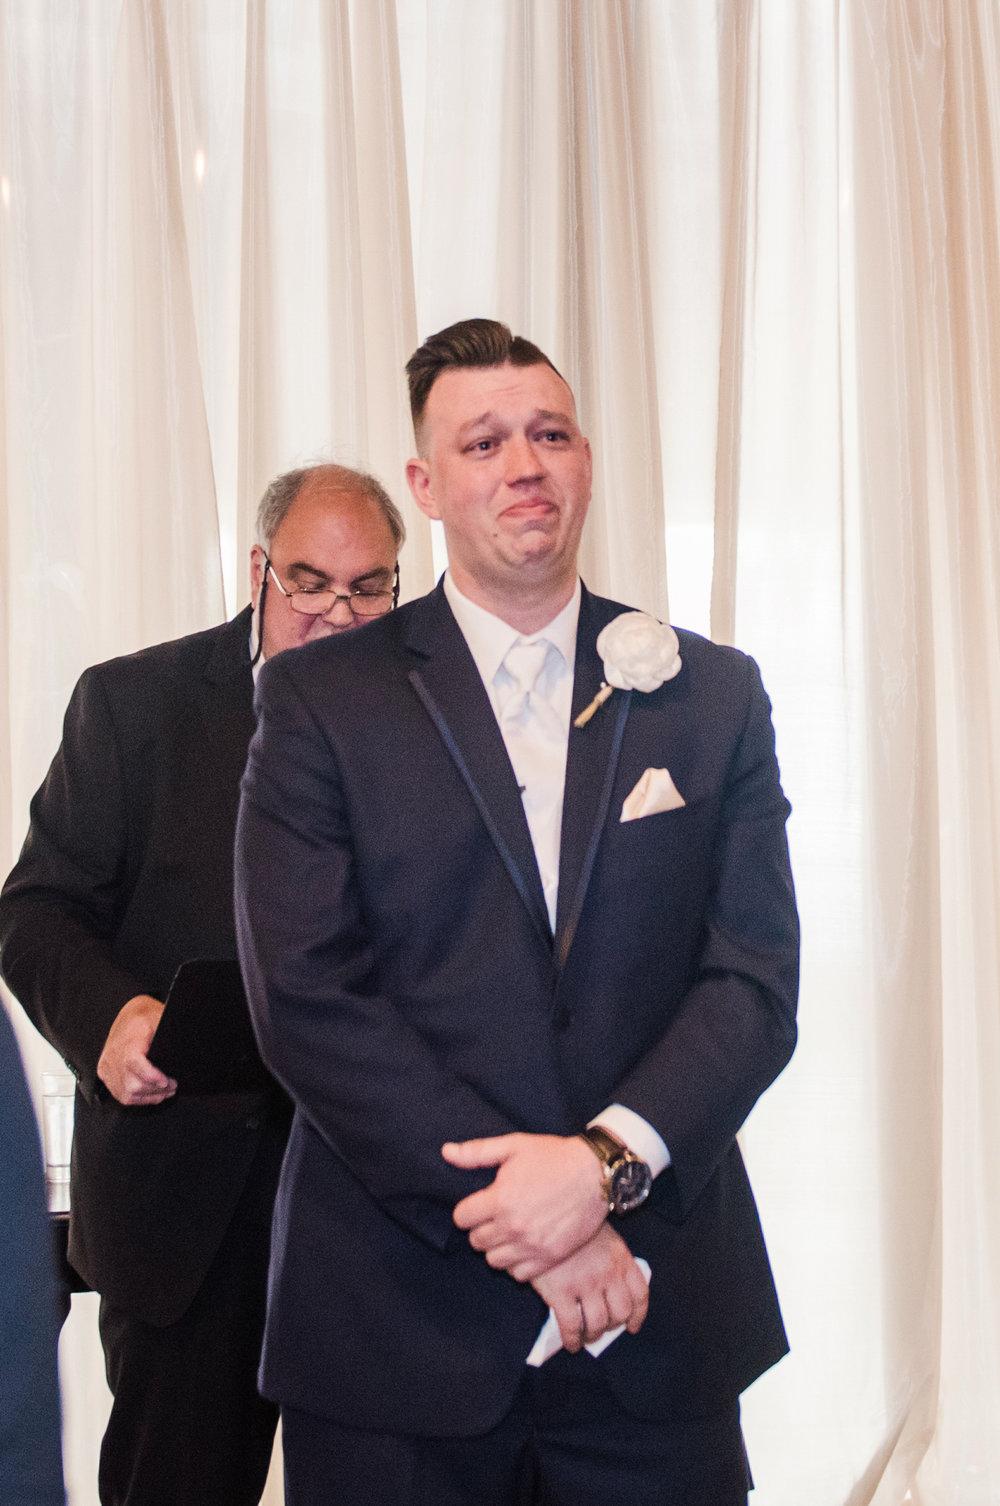 JILLSTUDIO_SKY_ArmorySyracuse_Wedding_Rochester_NY_Photographer_DSC_2667.jpg